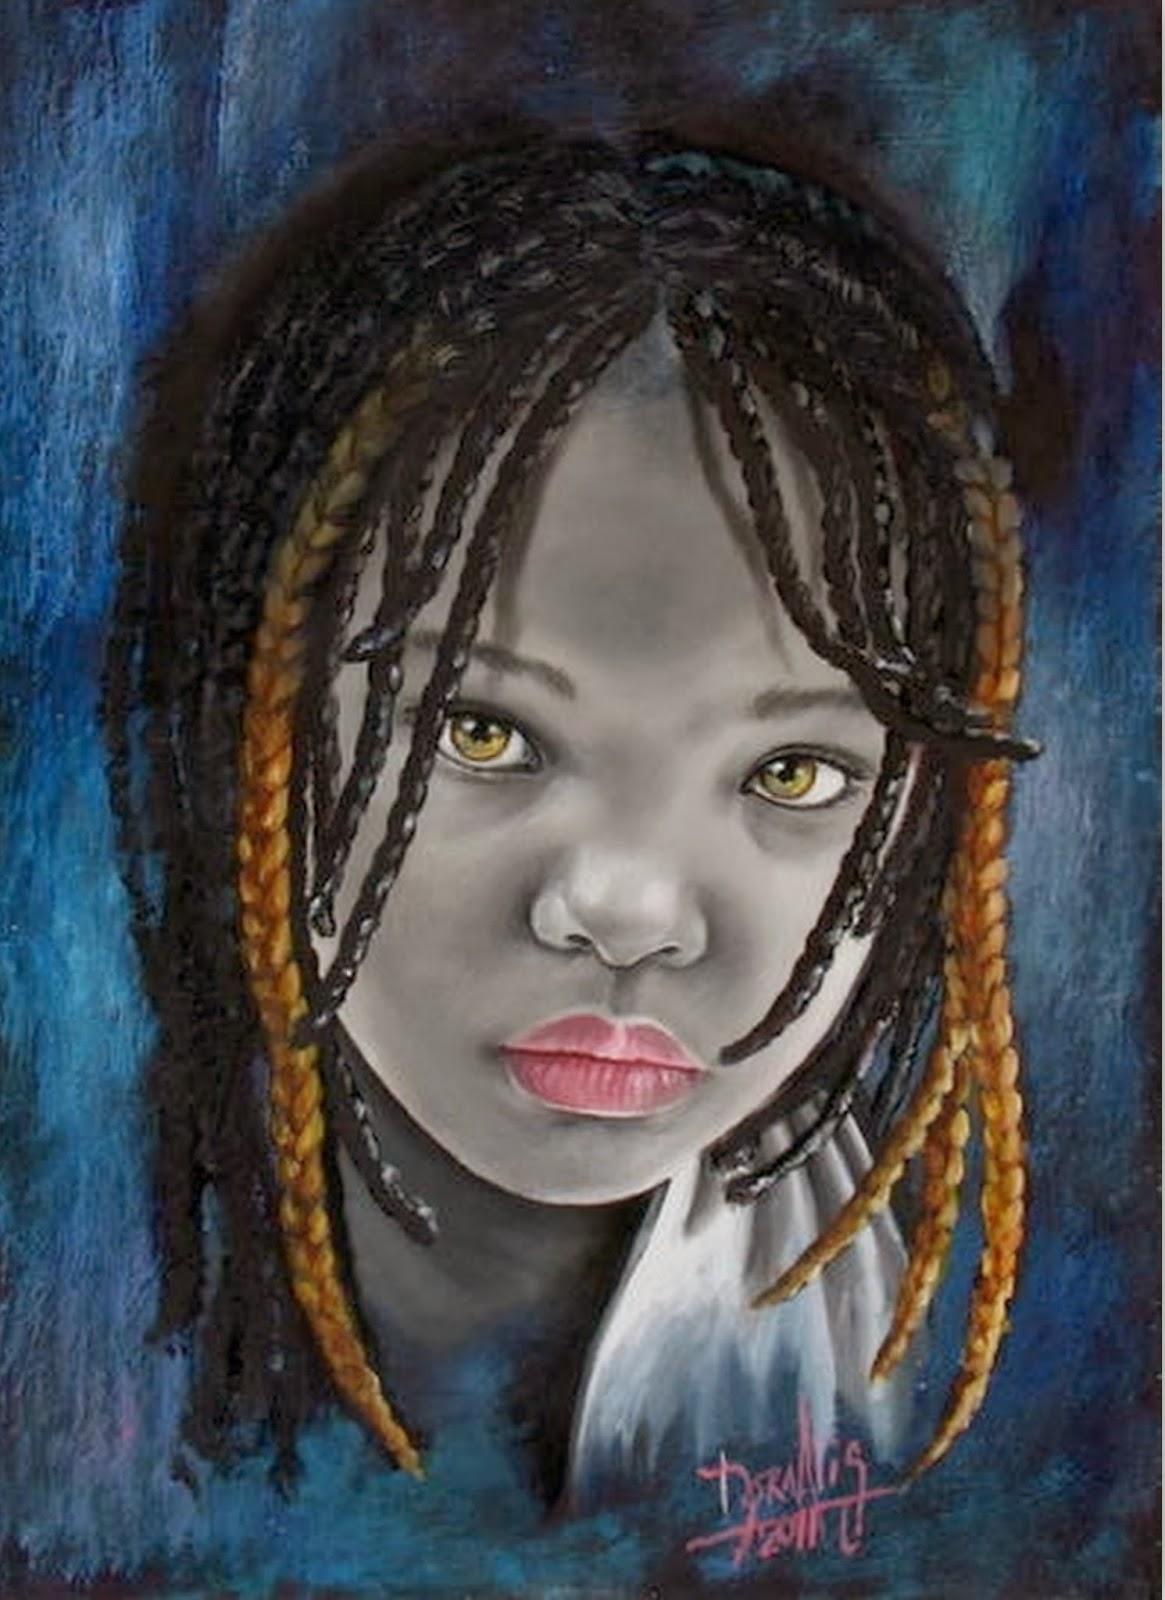 Pintura moderna y fotograf a art stica rostros africanos - Pinturas de cara para ninos ...